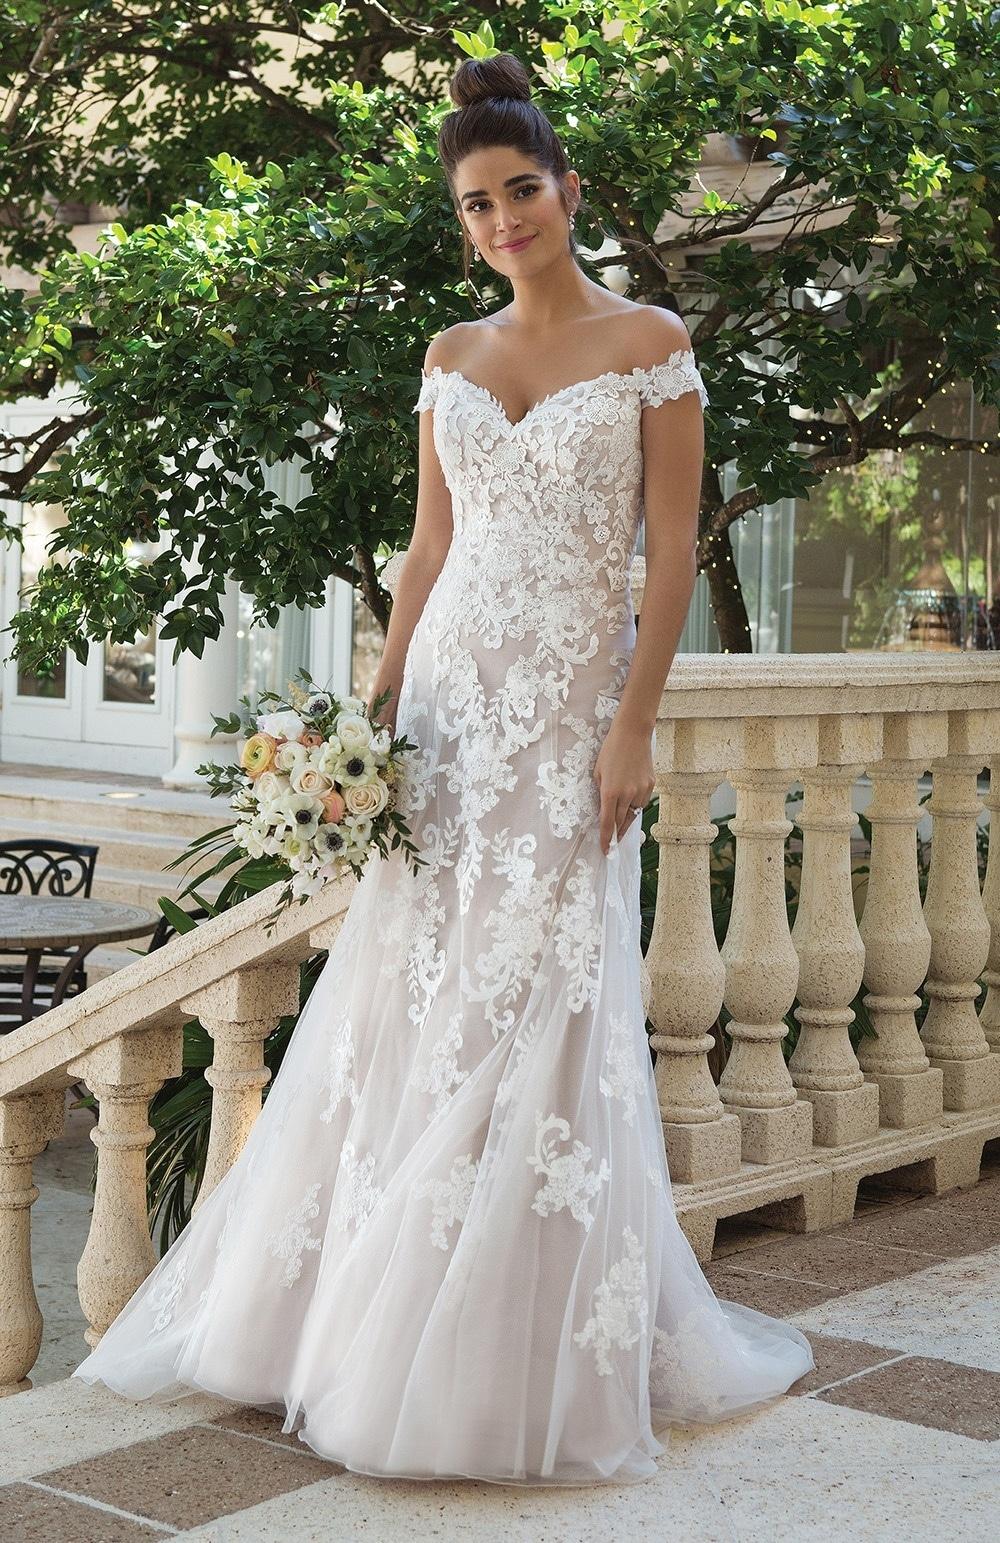 Robe de mariée Modèle Shauna